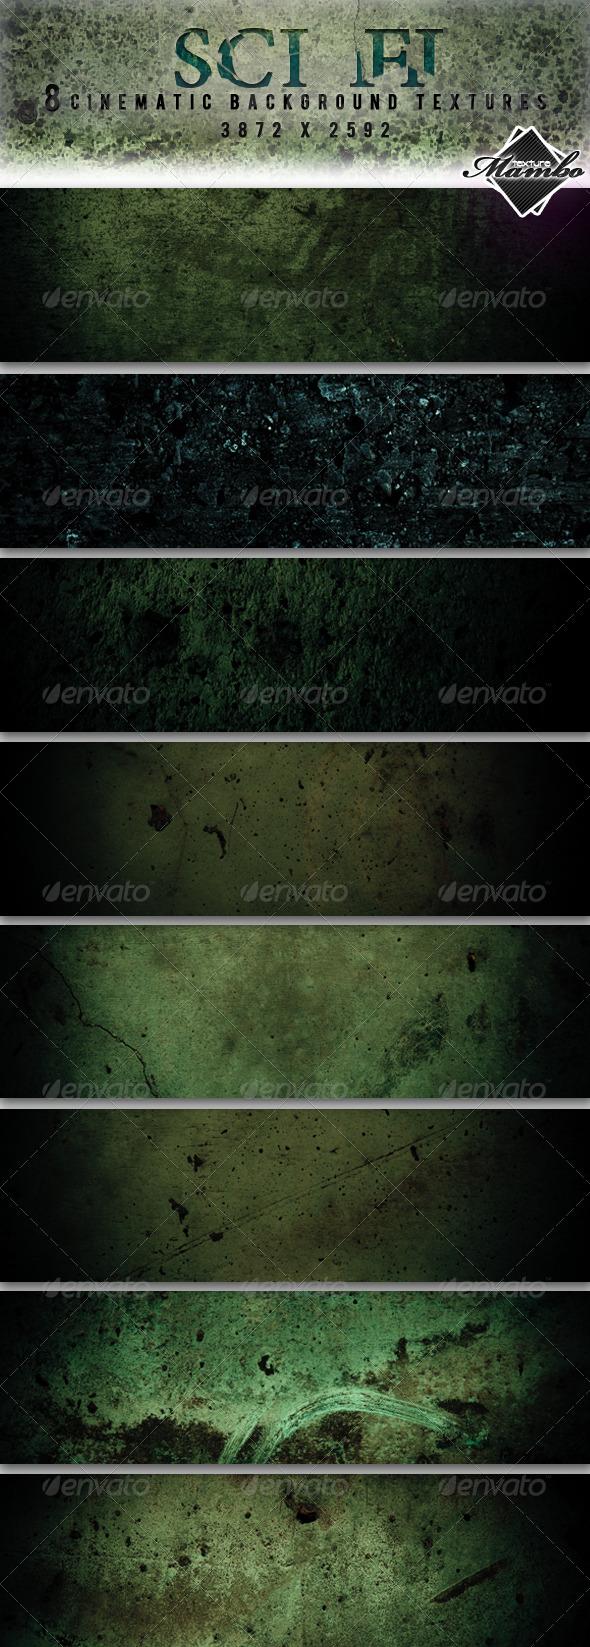 Sci Fi - Cinematic background textures - Industrial / Grunge Textures